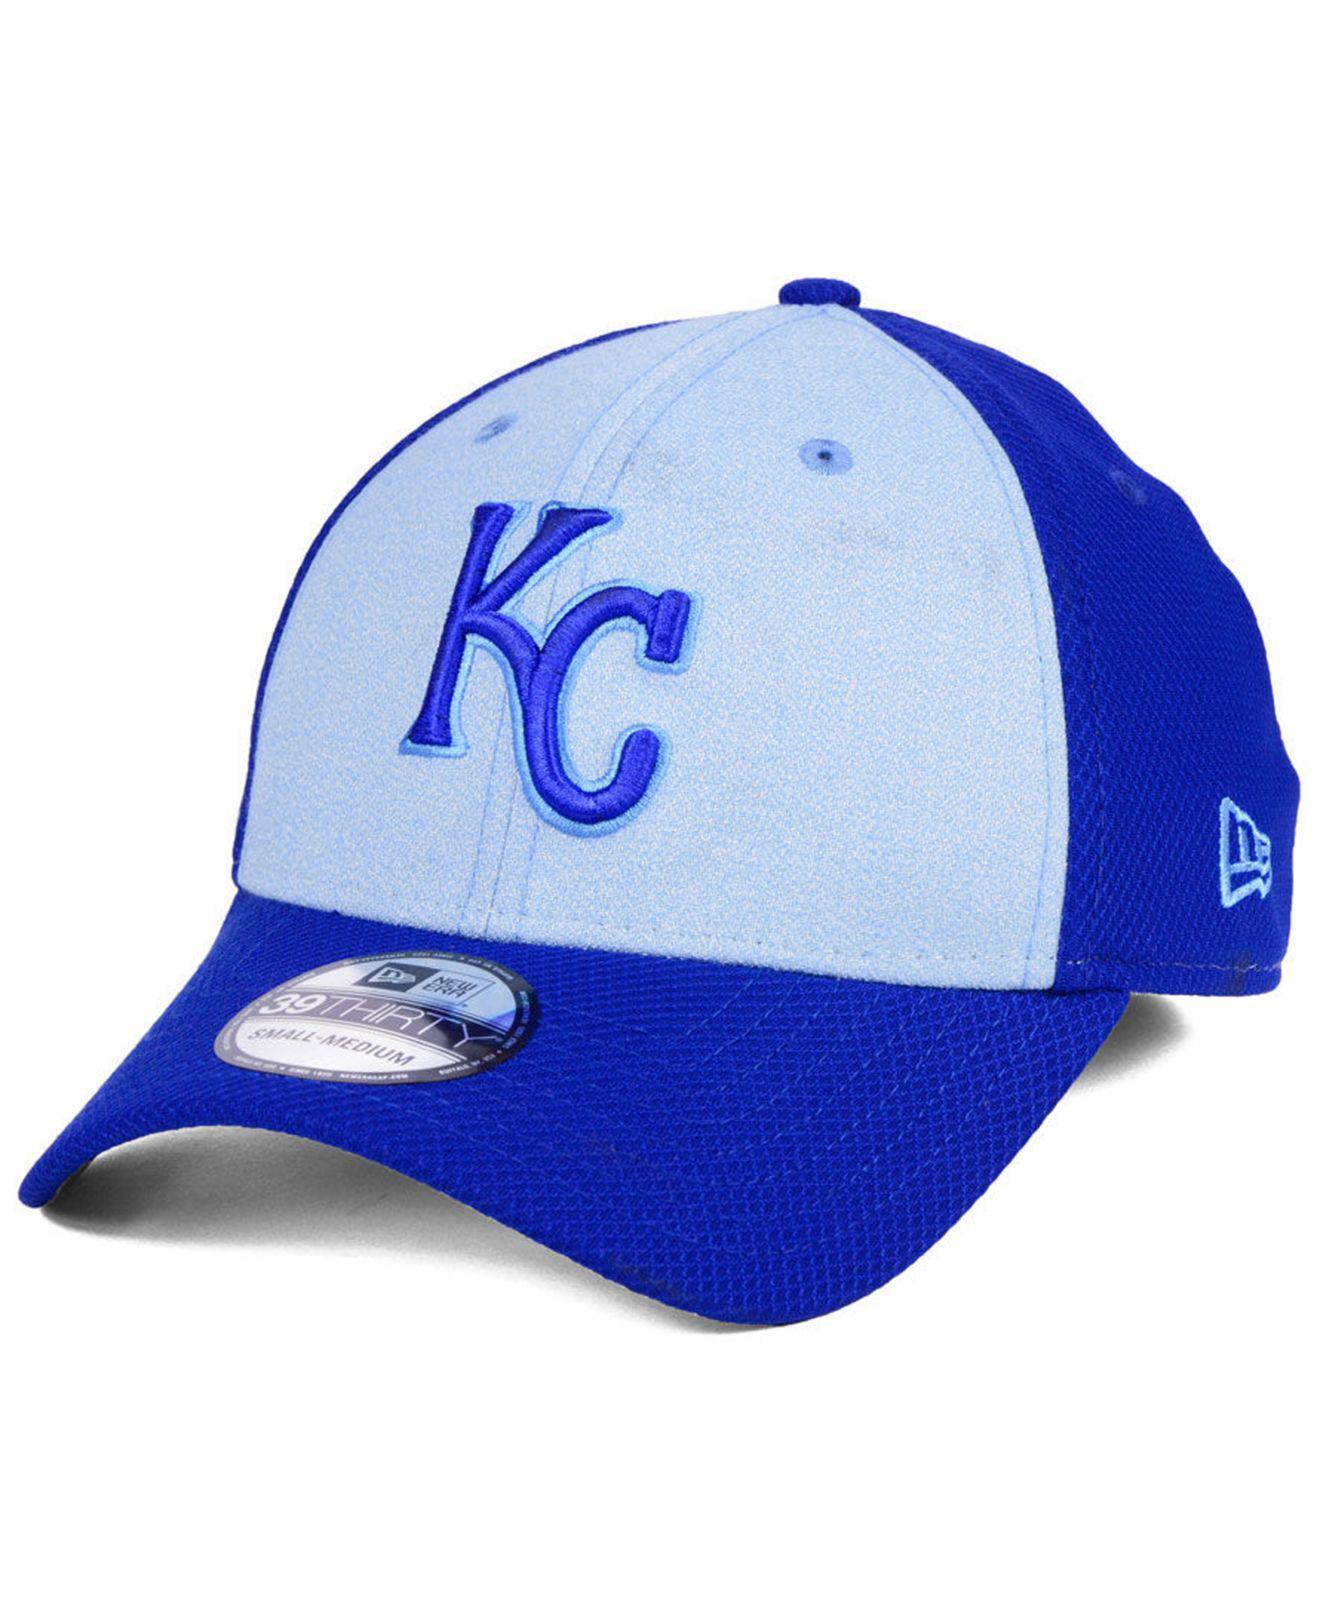 newest 82c21 450cf ... hat by new era 22a02 84951  amazon ktz. mens blue kansas city royals  fathers day 39thirty strapback cap 2018 eb7c4 72688